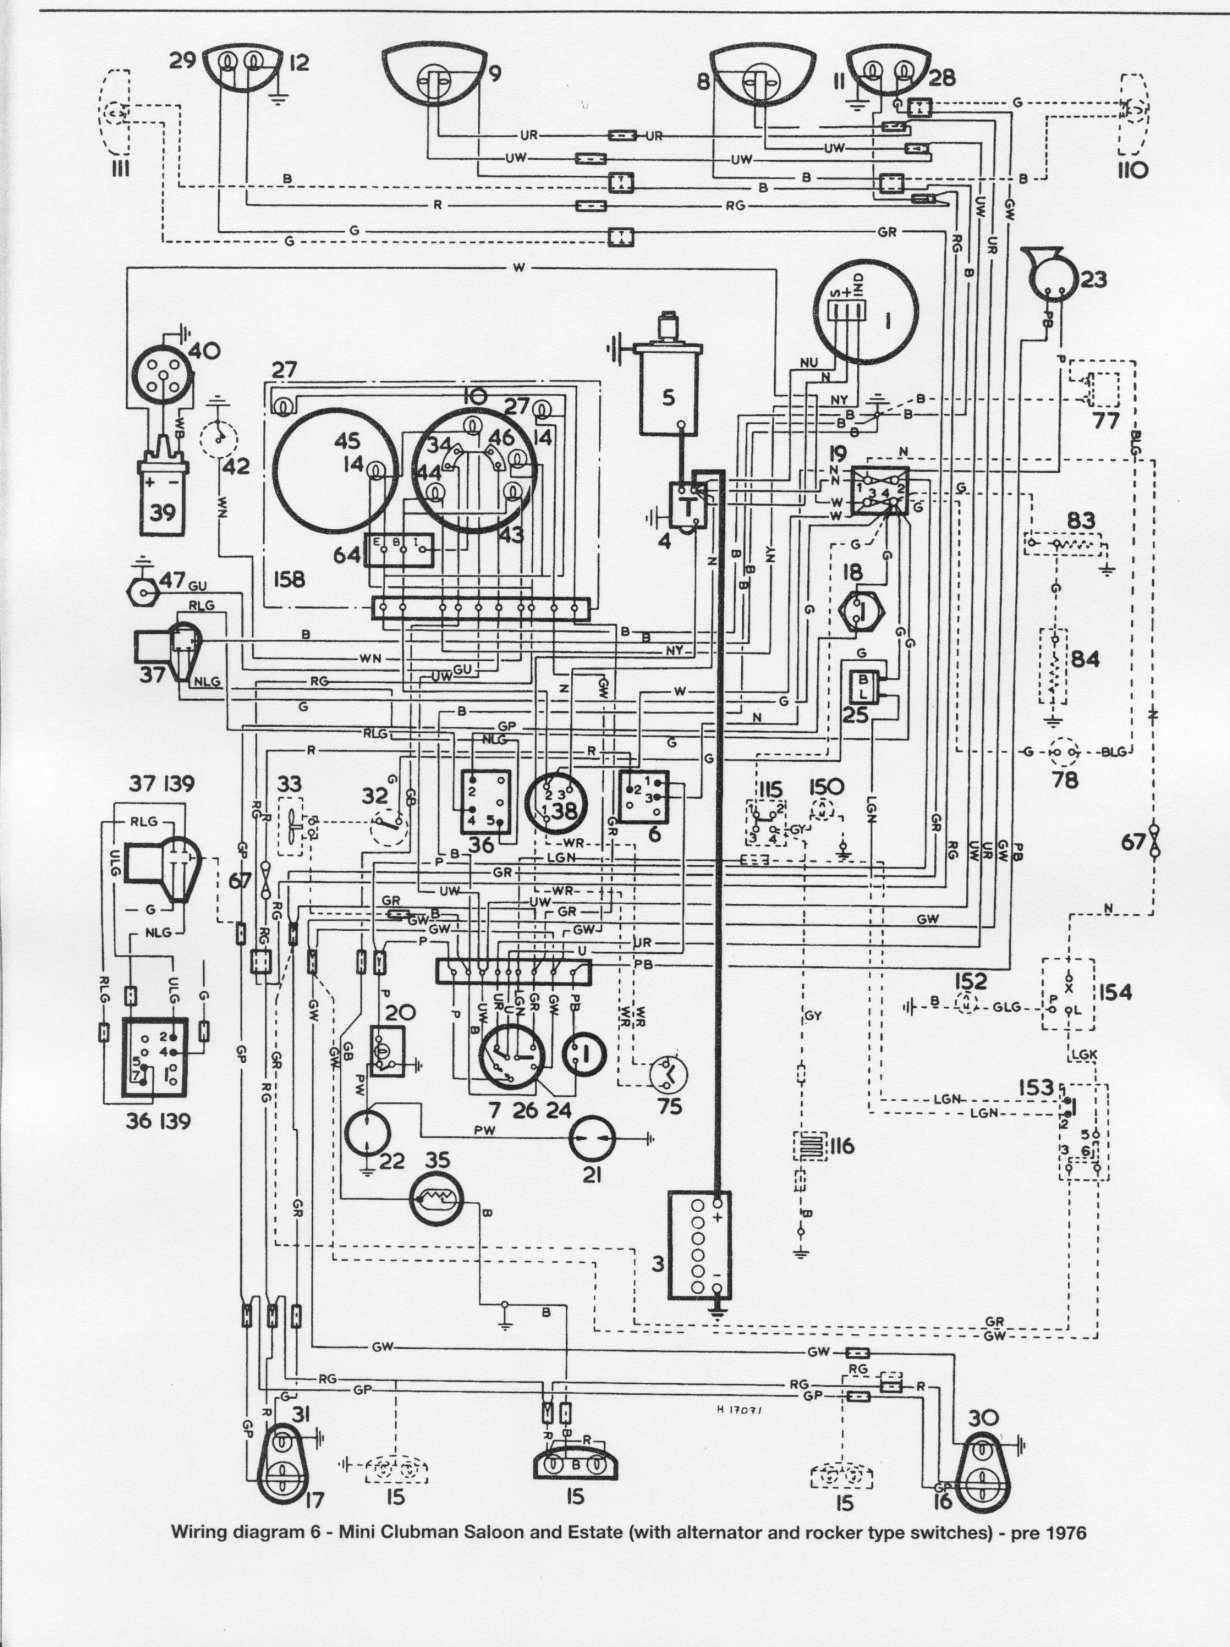 medium resolution of 1990 mini cooper wiring diagram wiring diagram user 1990 mini cooper wiring diagram wiring diagrams konsult